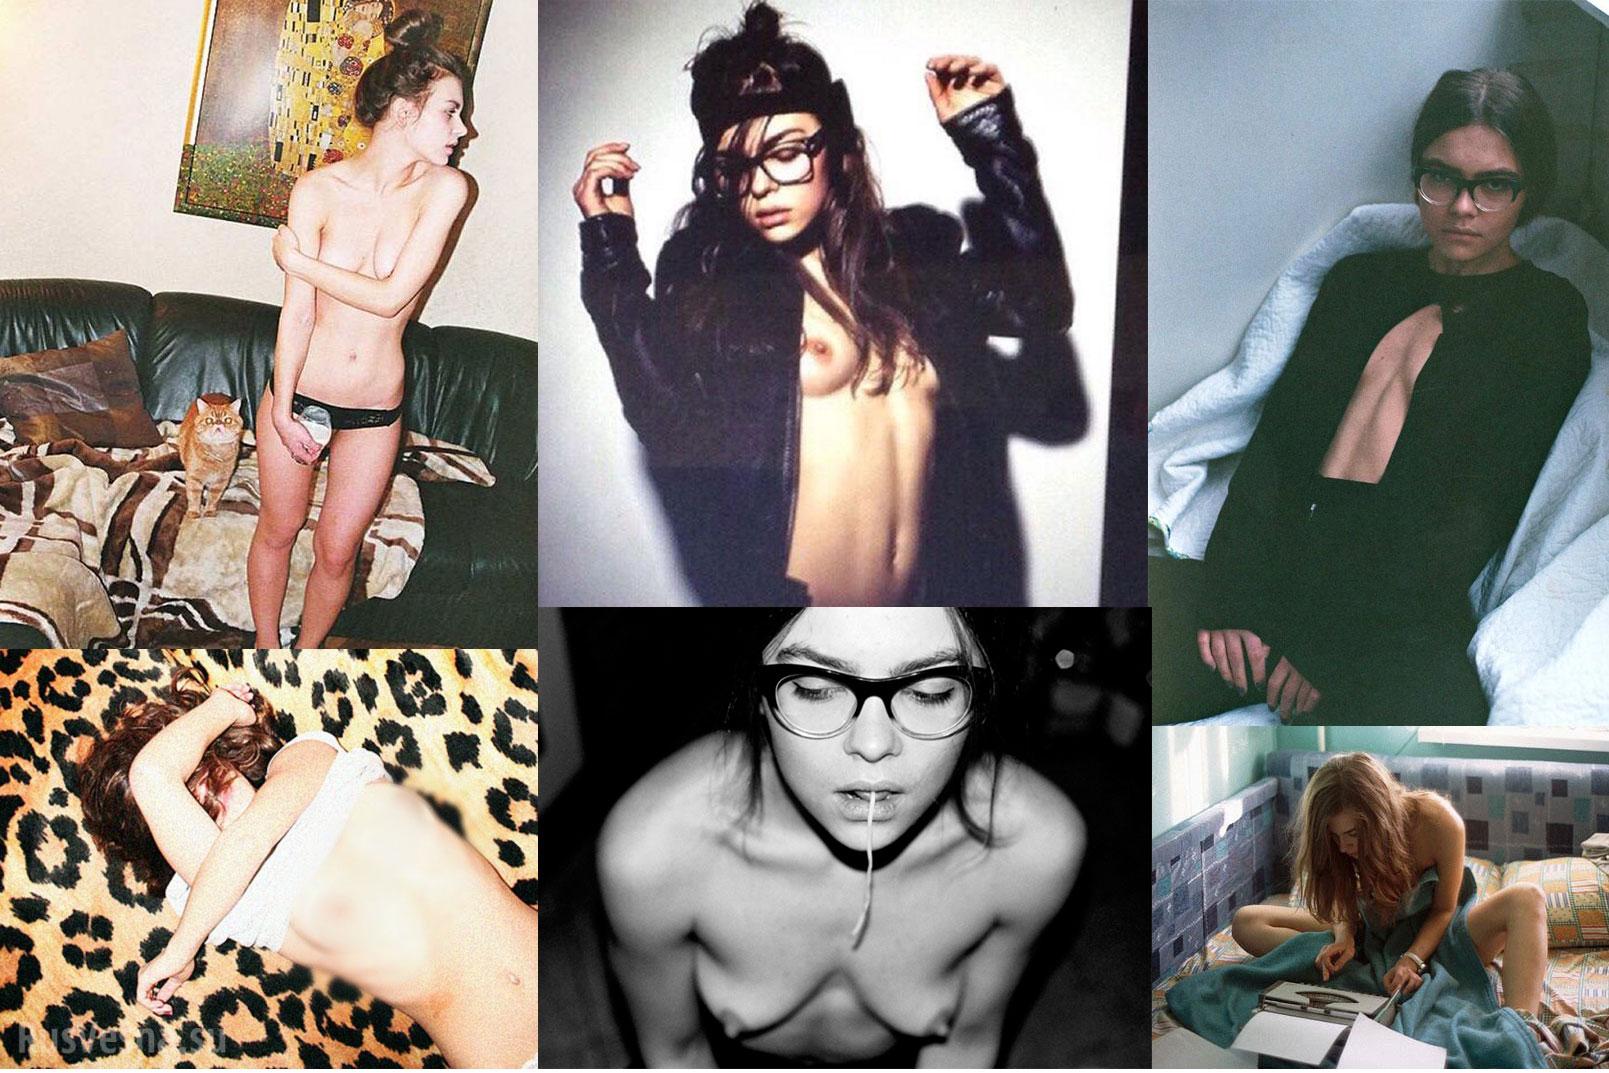 Anastasia Deeva Leaked nikki bella голая очень классная порнуха - 8n2t.pikdamapridi.ru